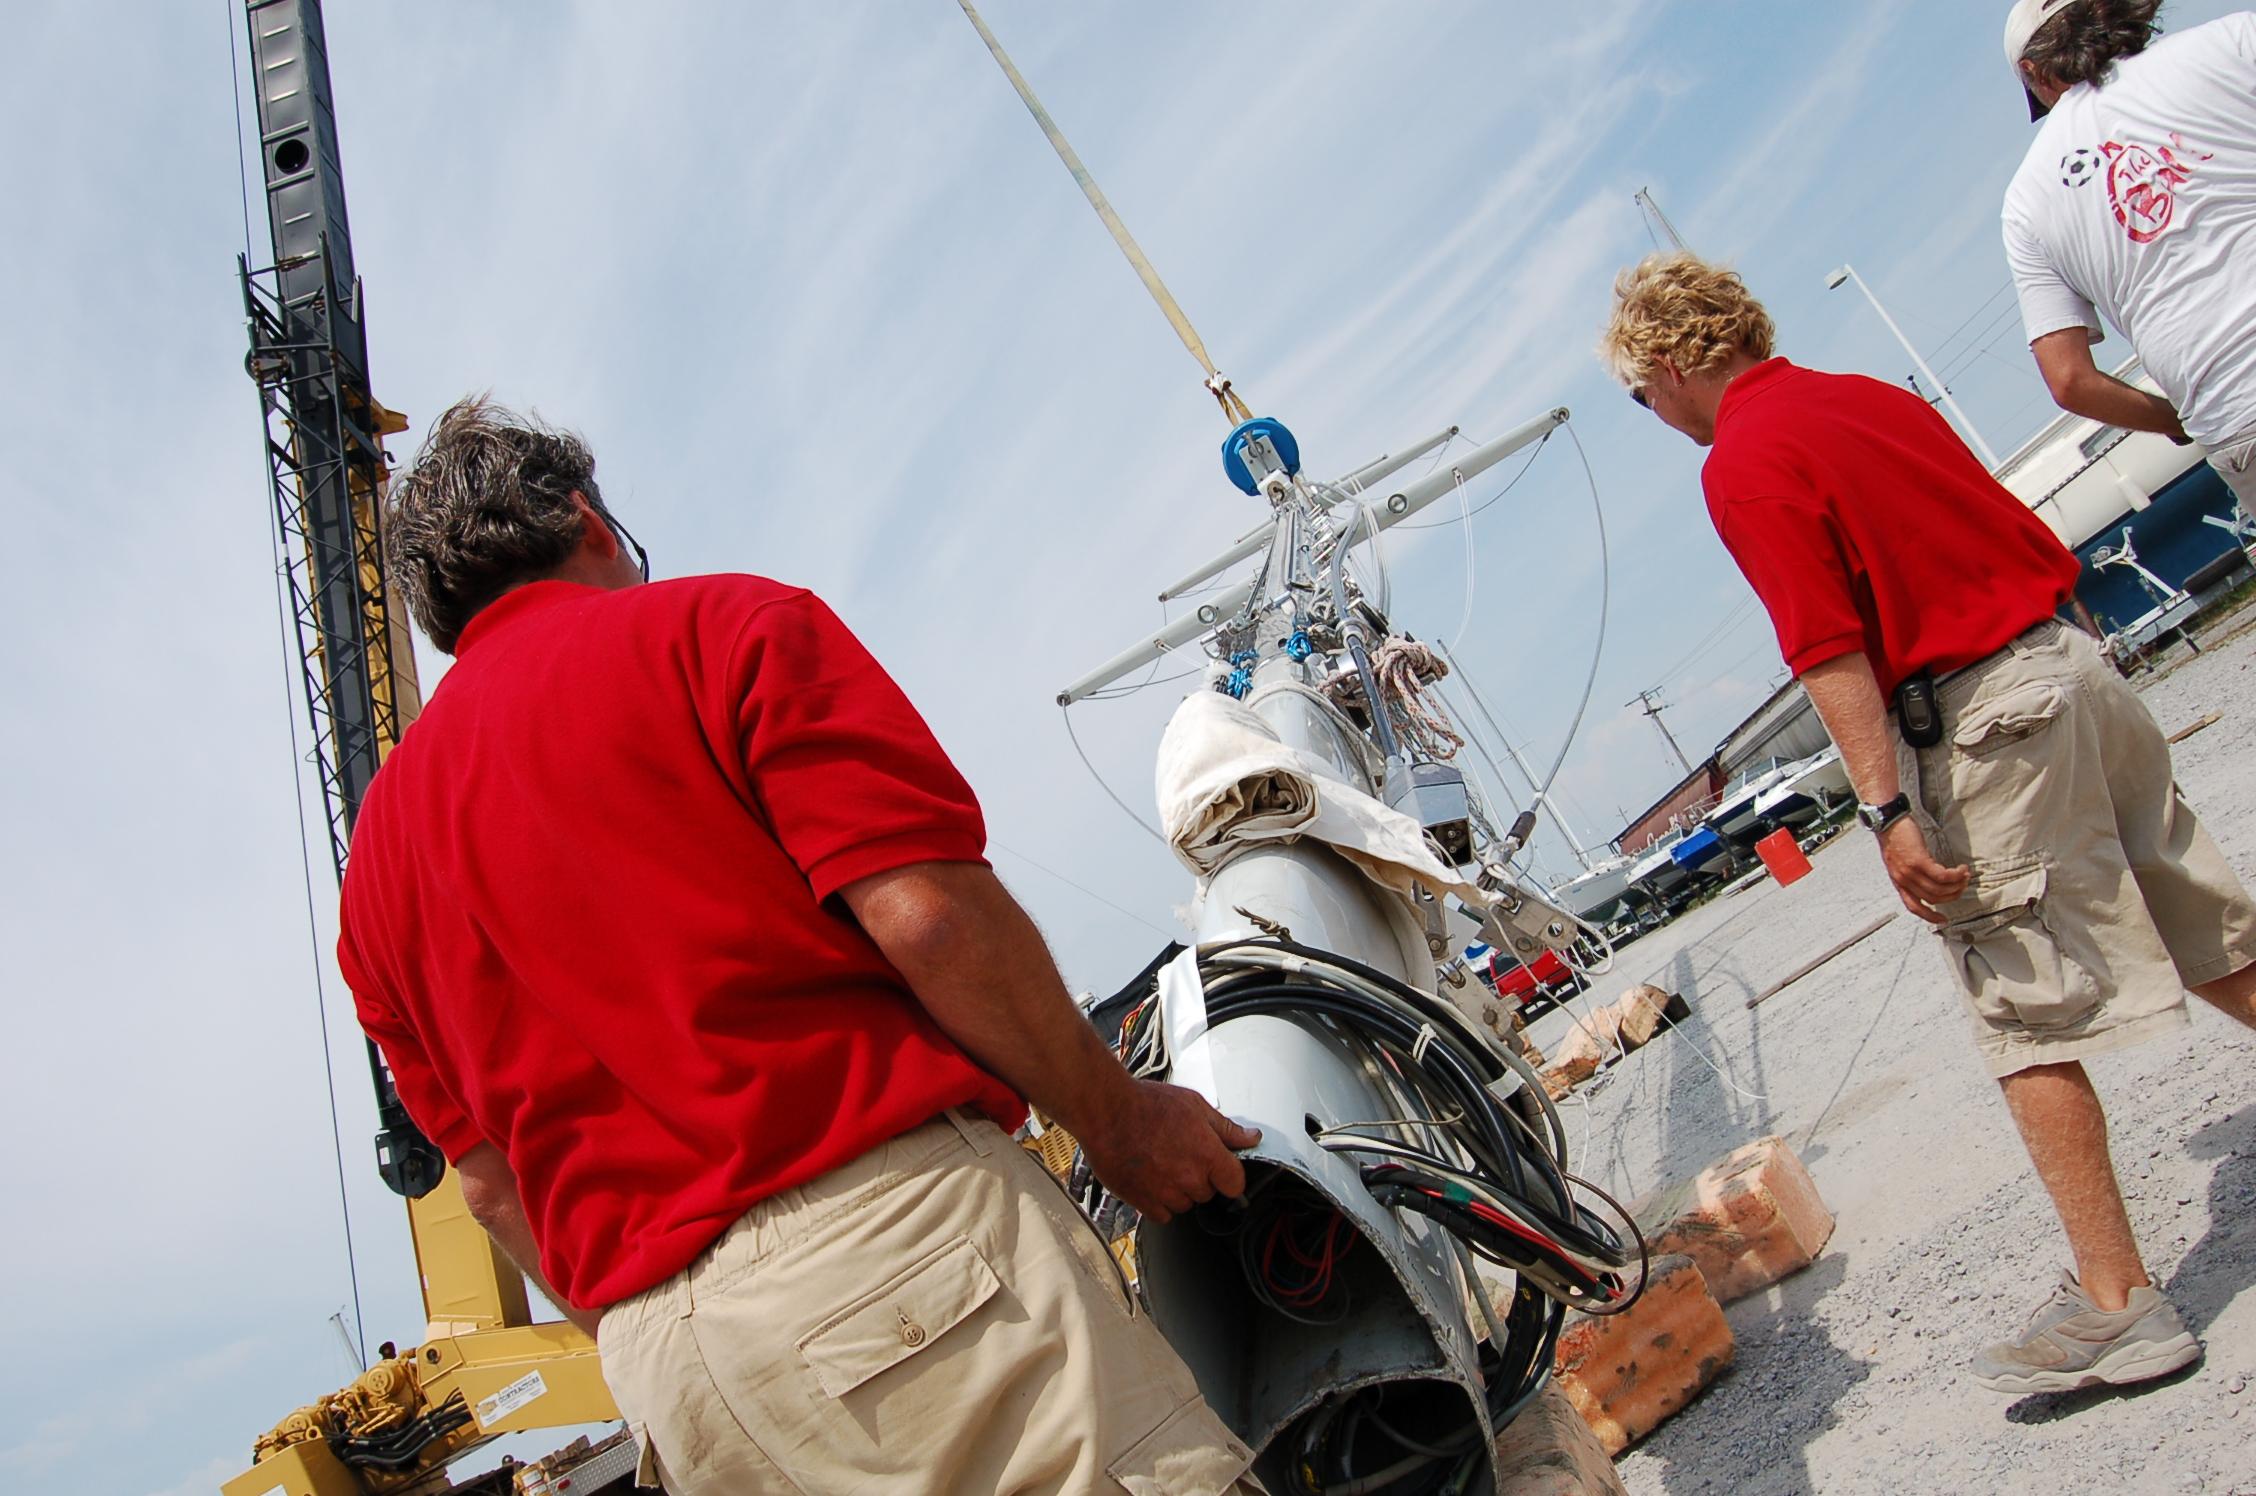 south shore yachts klacko